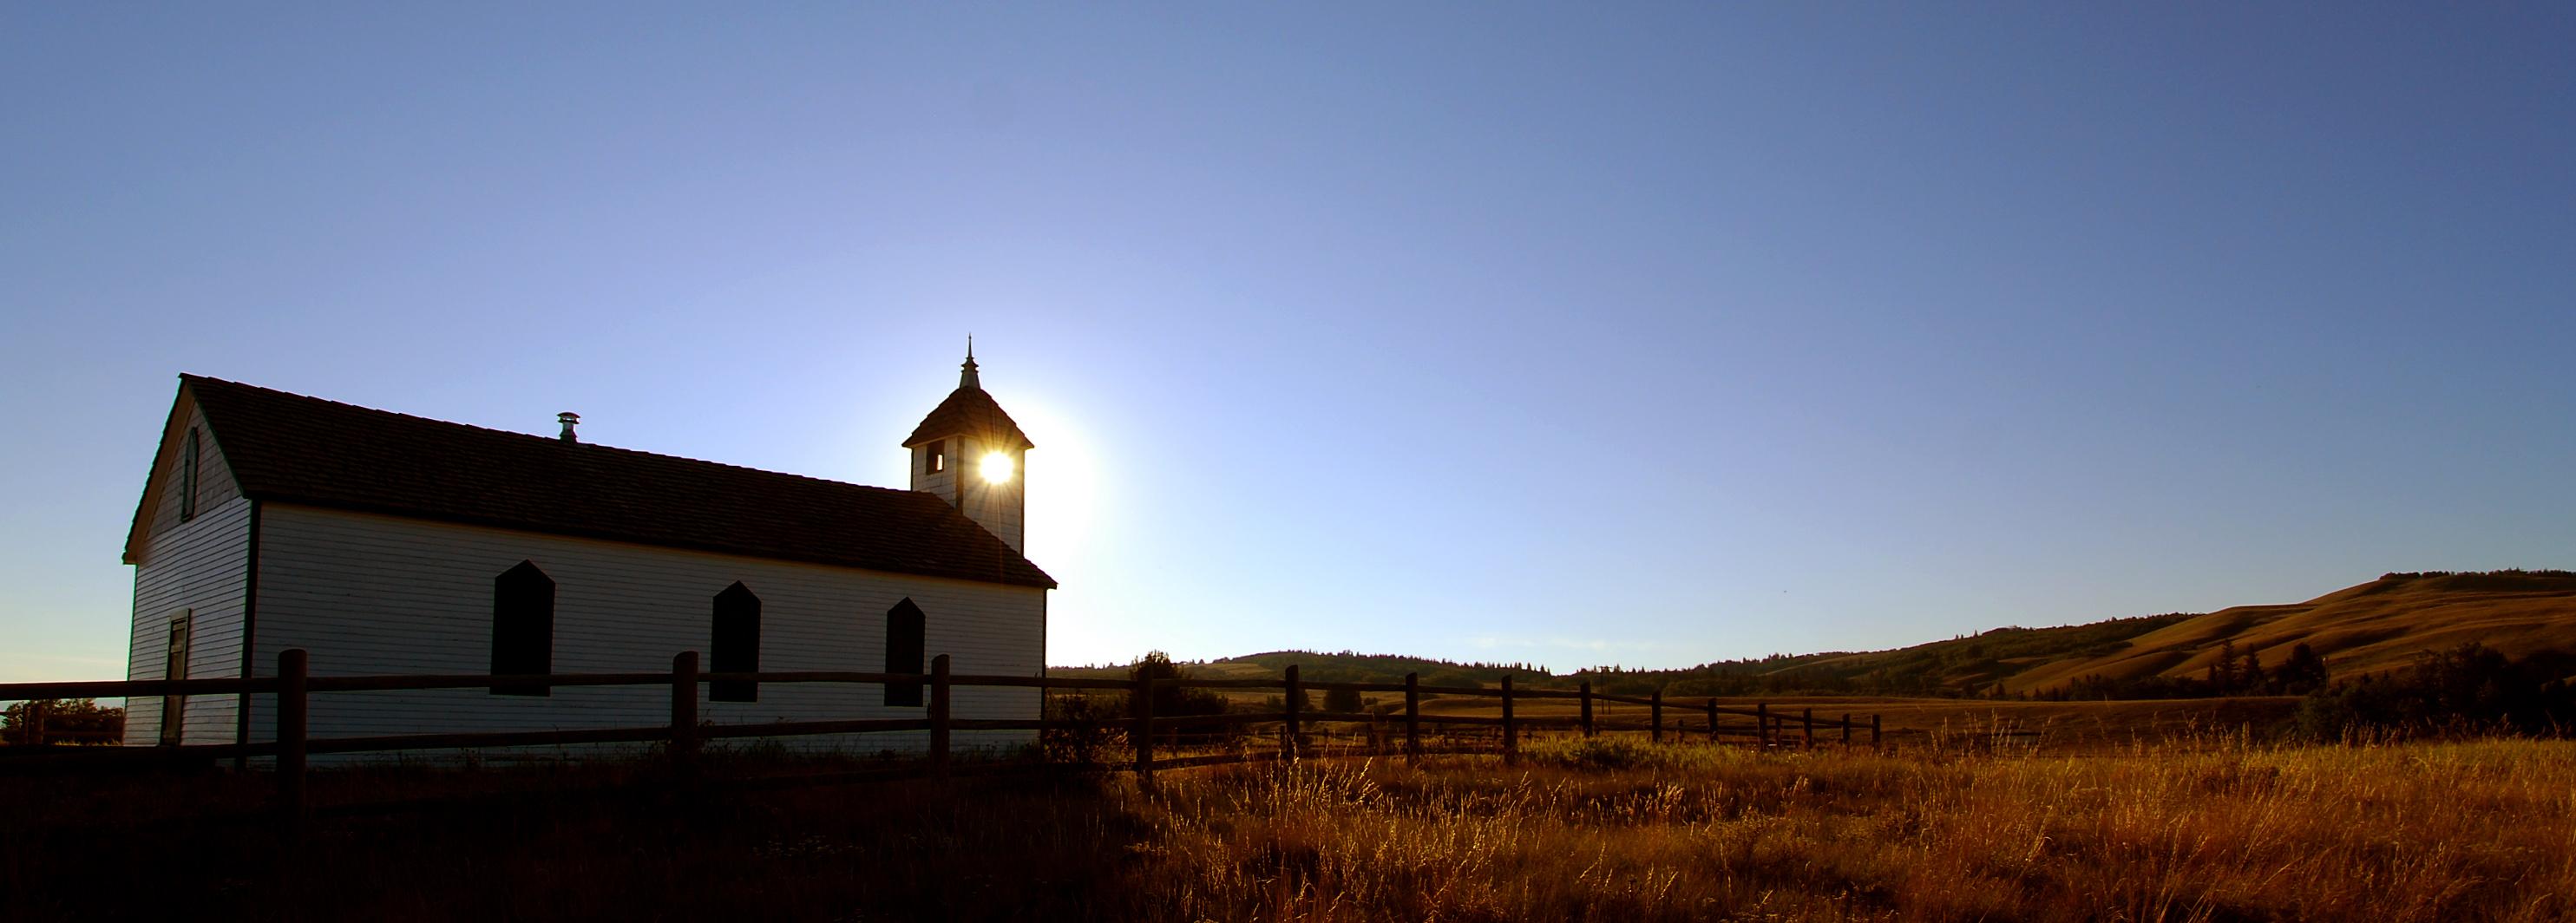 McDougall United Church (Morley, Alberta, 2012)